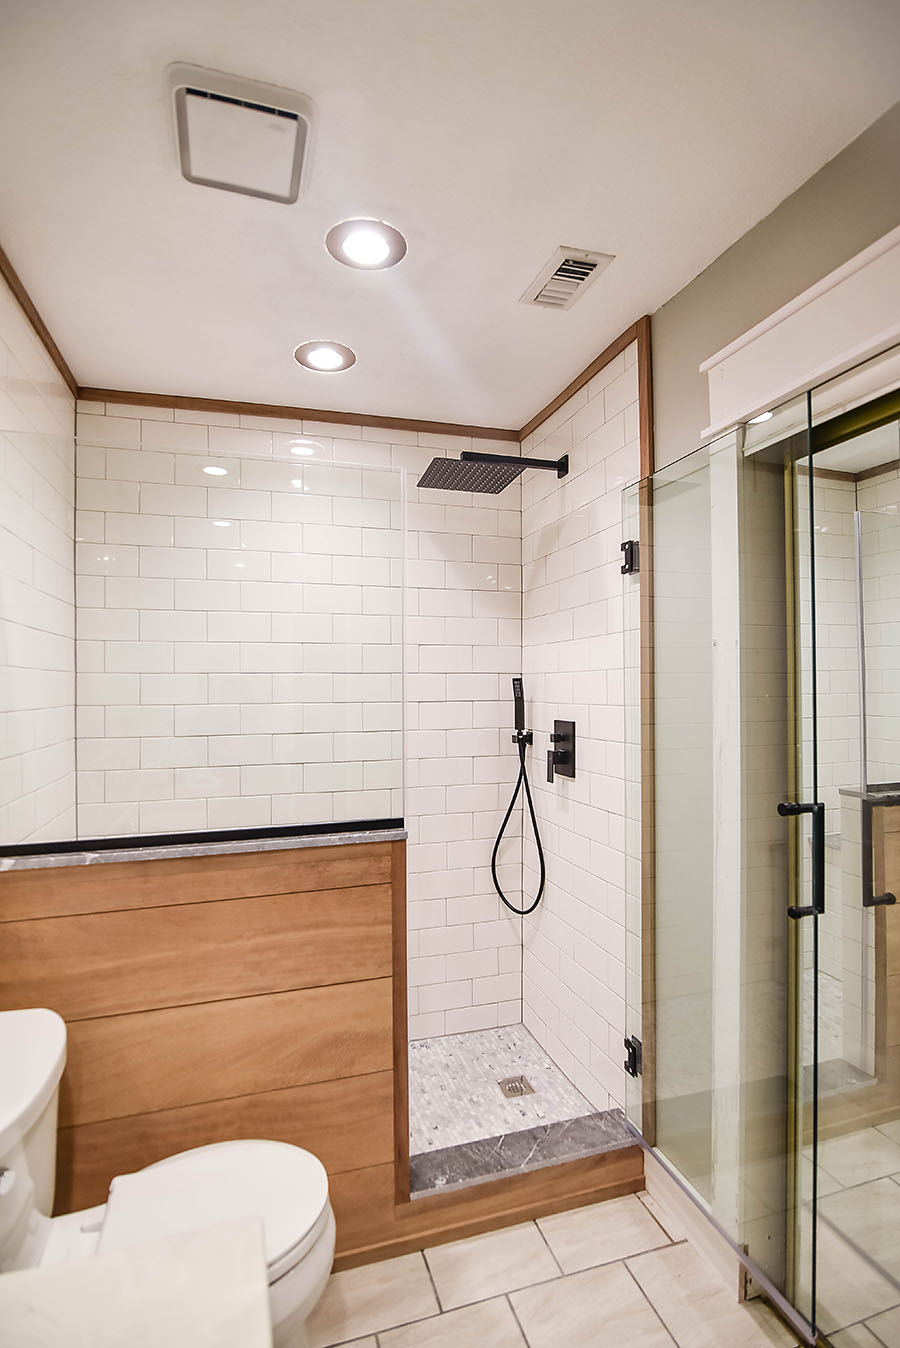 Master Bathroom Renovation - Converting a Bathtub into a Walk In